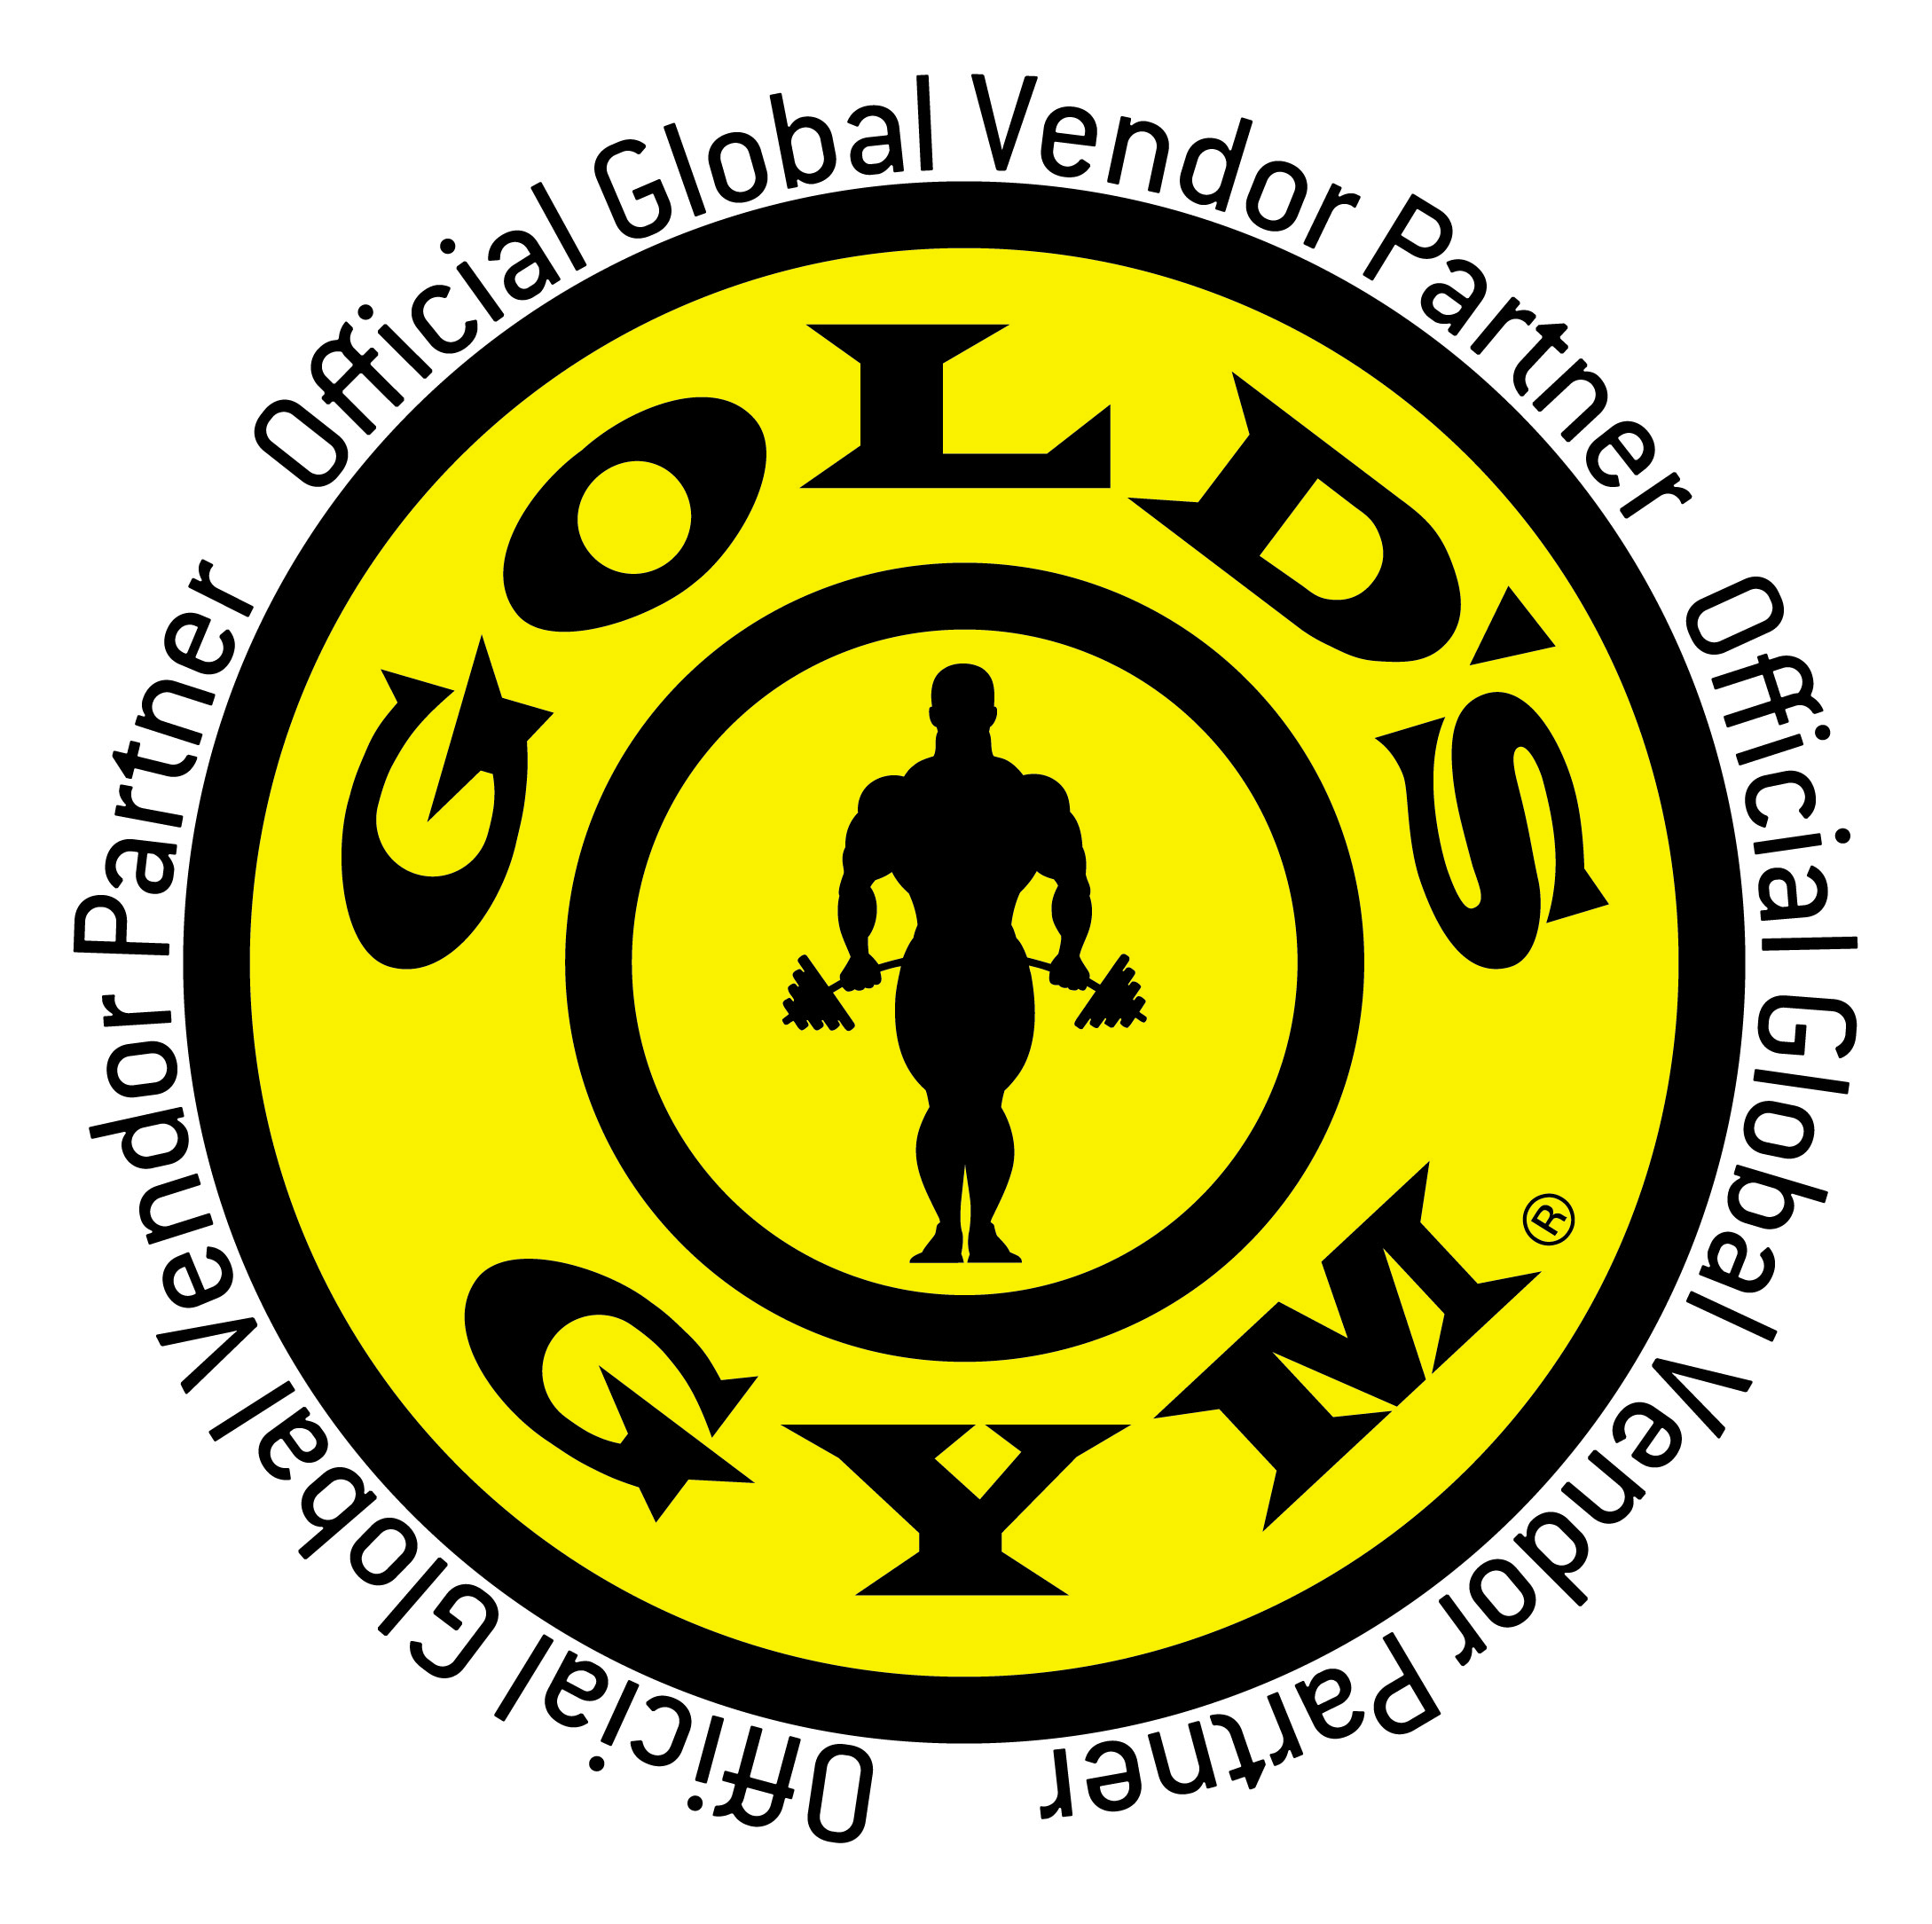 Golds Vendor Yellow